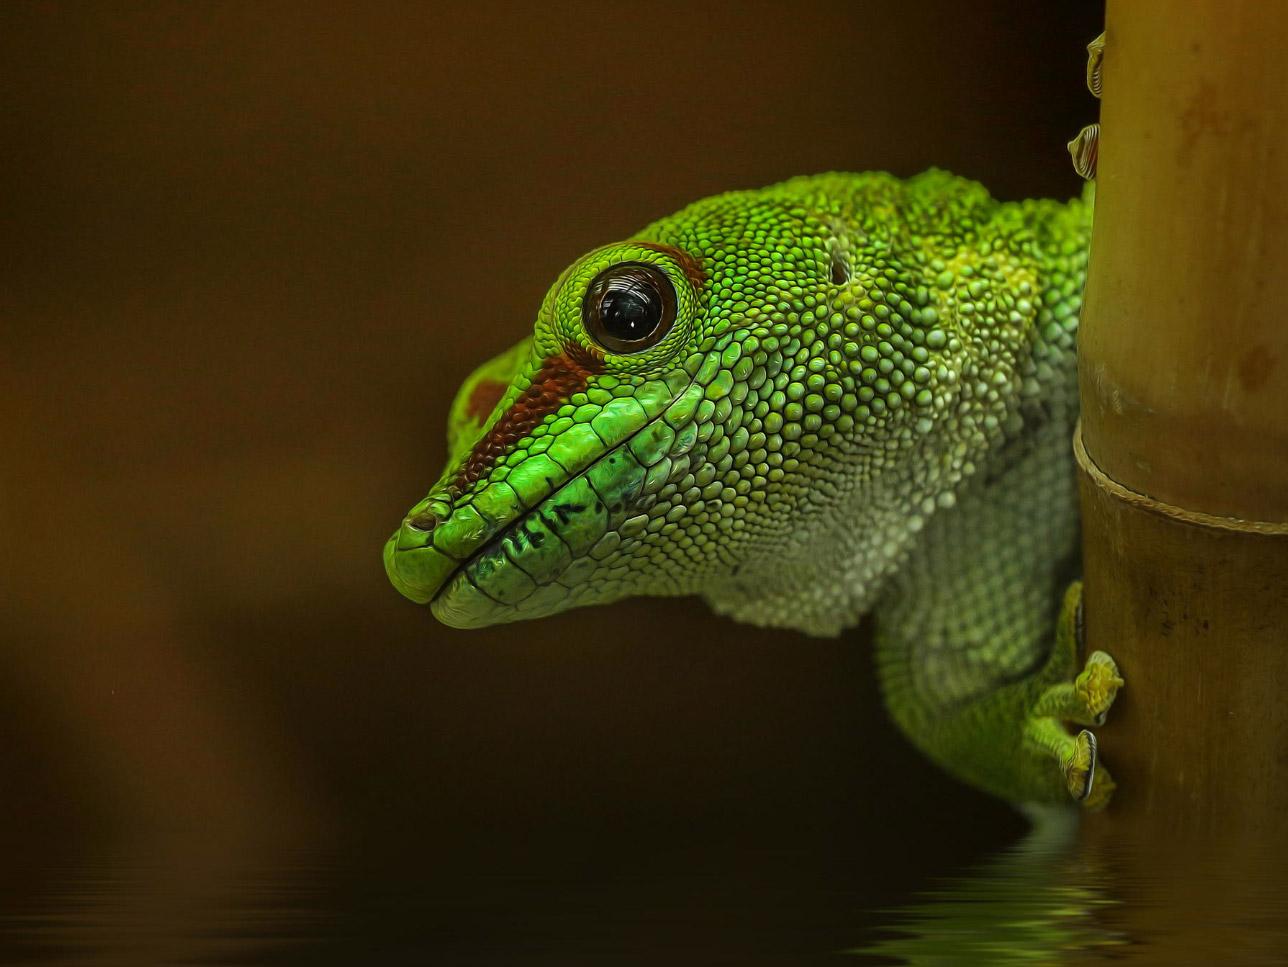 reptiles-amphibians-detlef-knapp-04